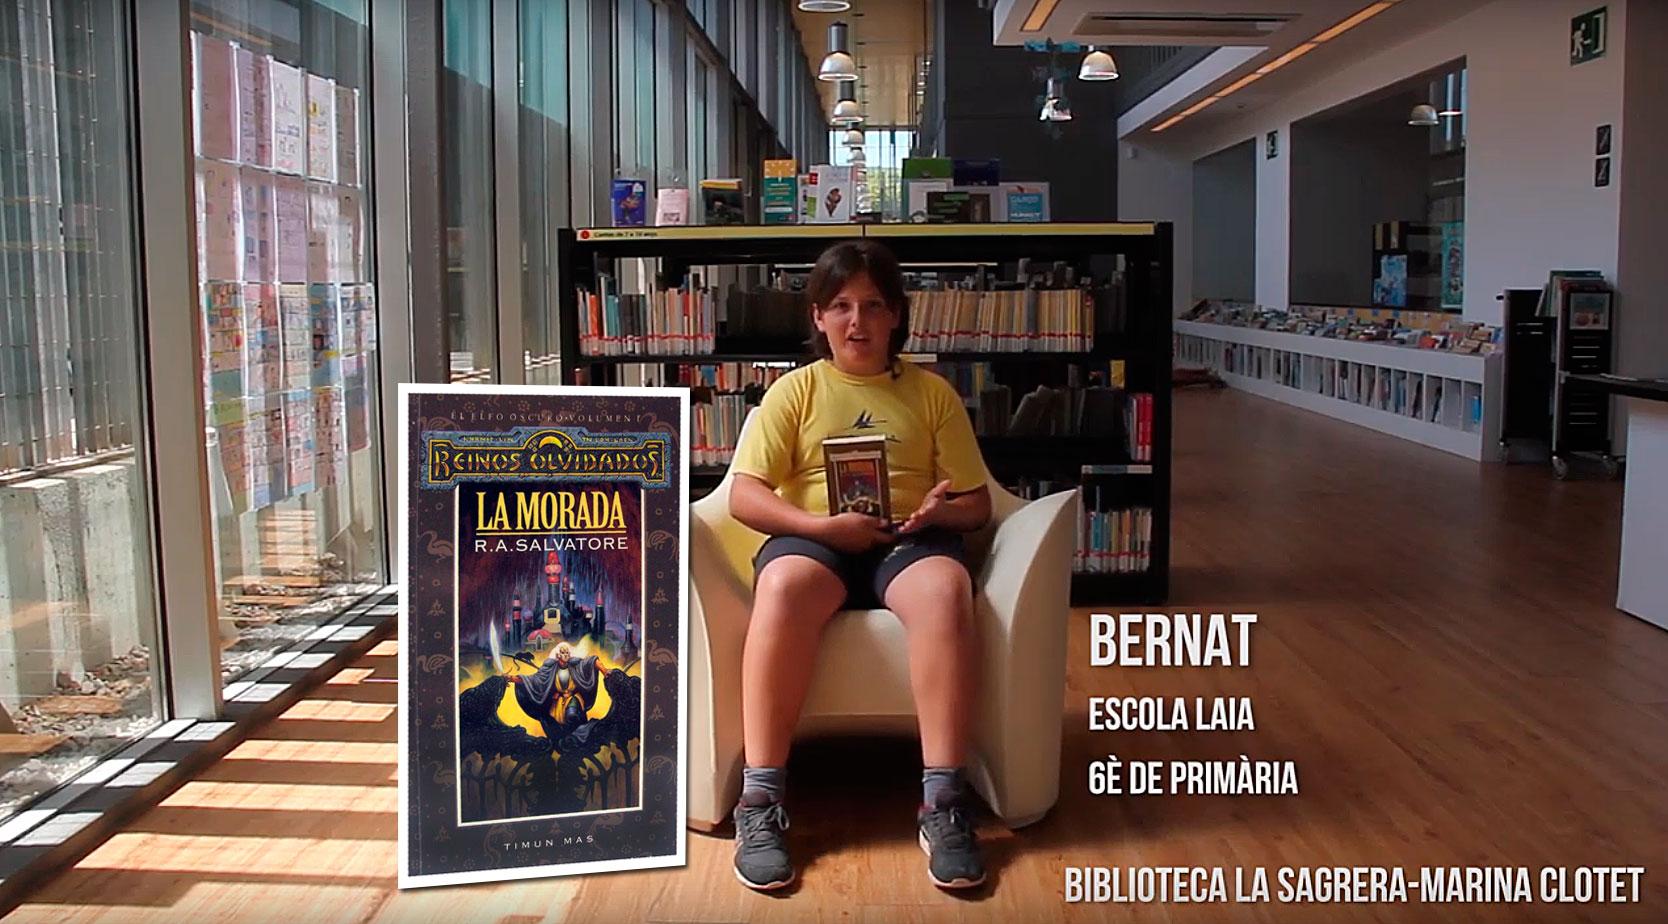 Bernat - La Morada - Salvatore, R. A.